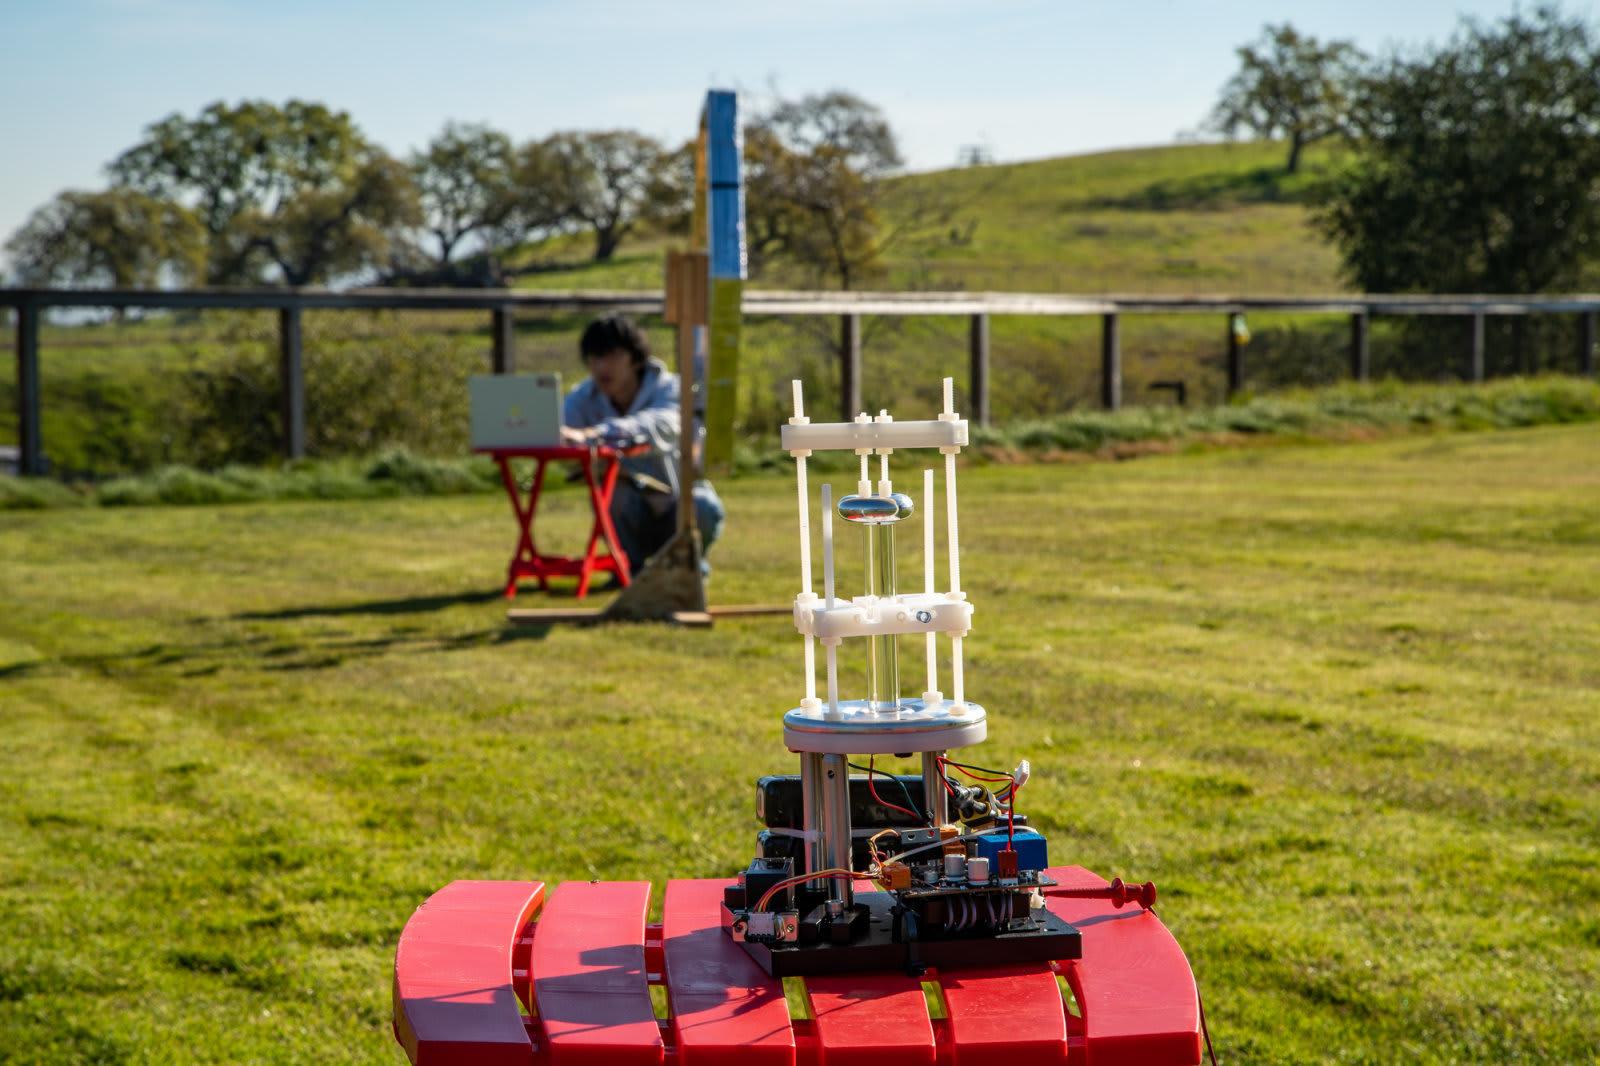 Dawn Harmer/SLAC National Accelerator Laboratory